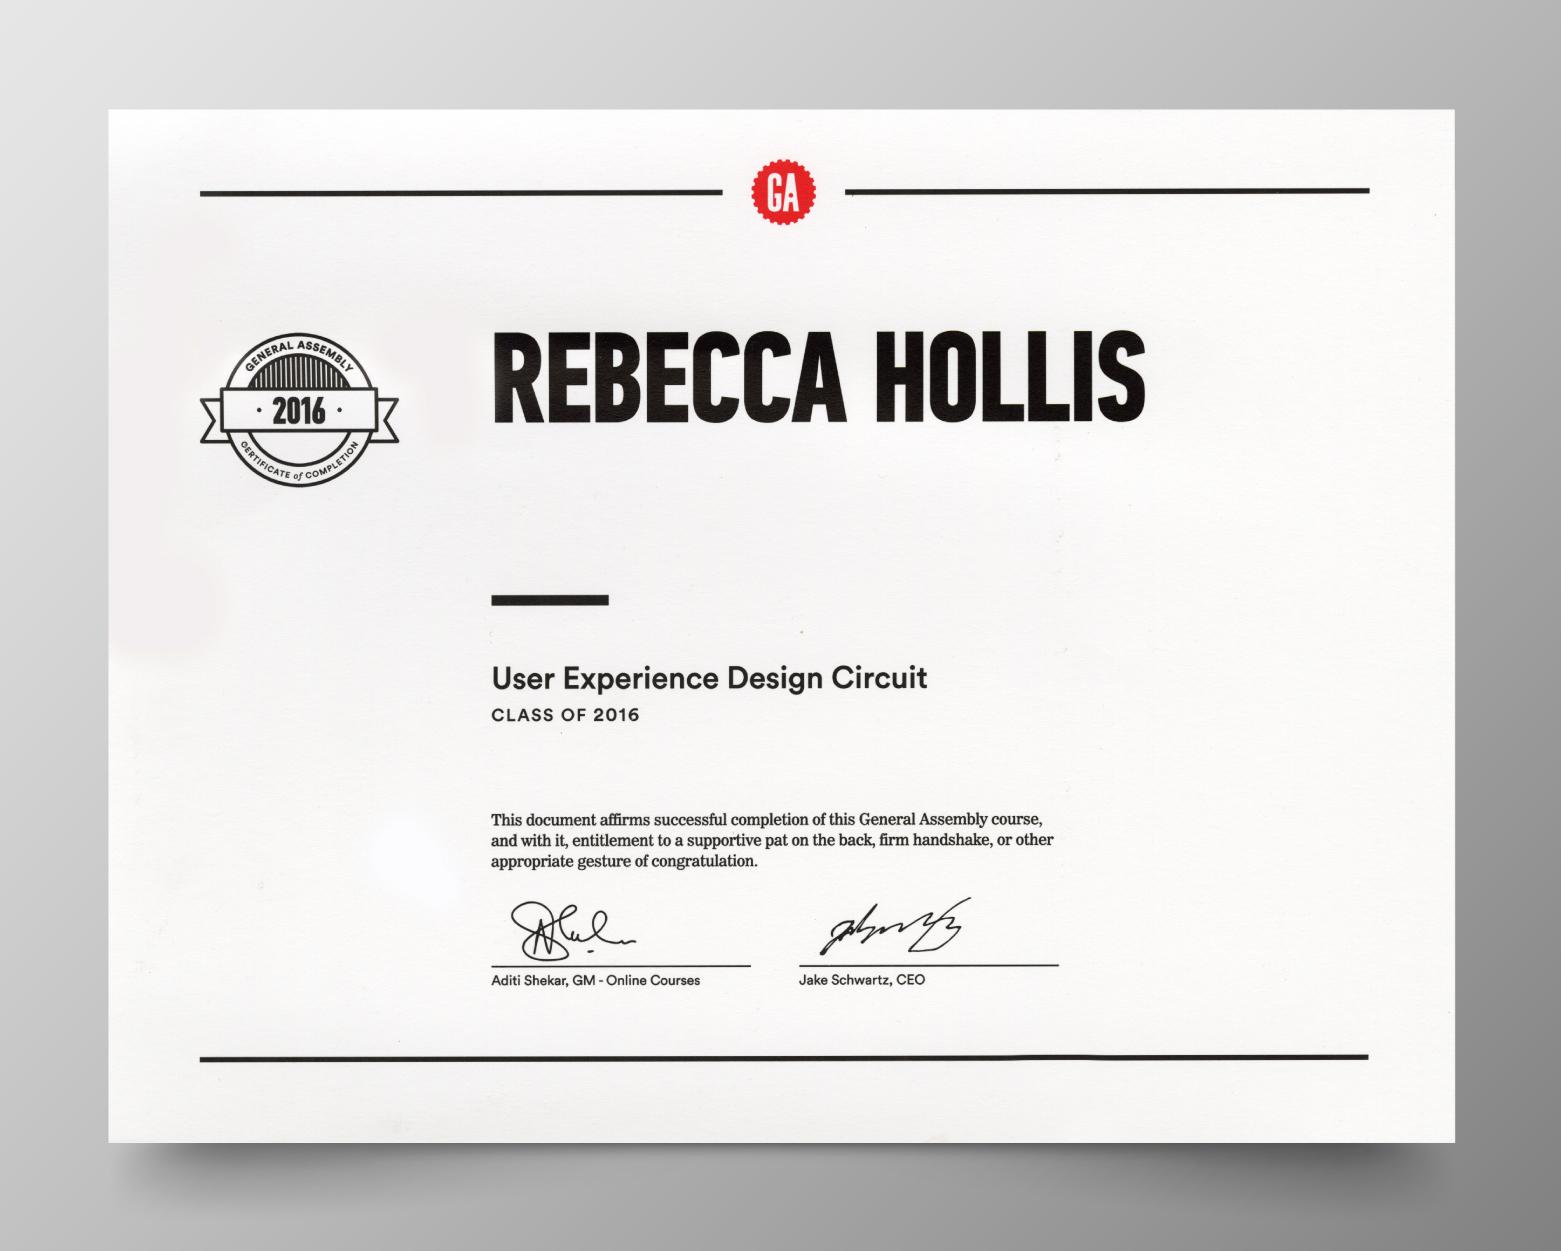 About Rebecca Hollis